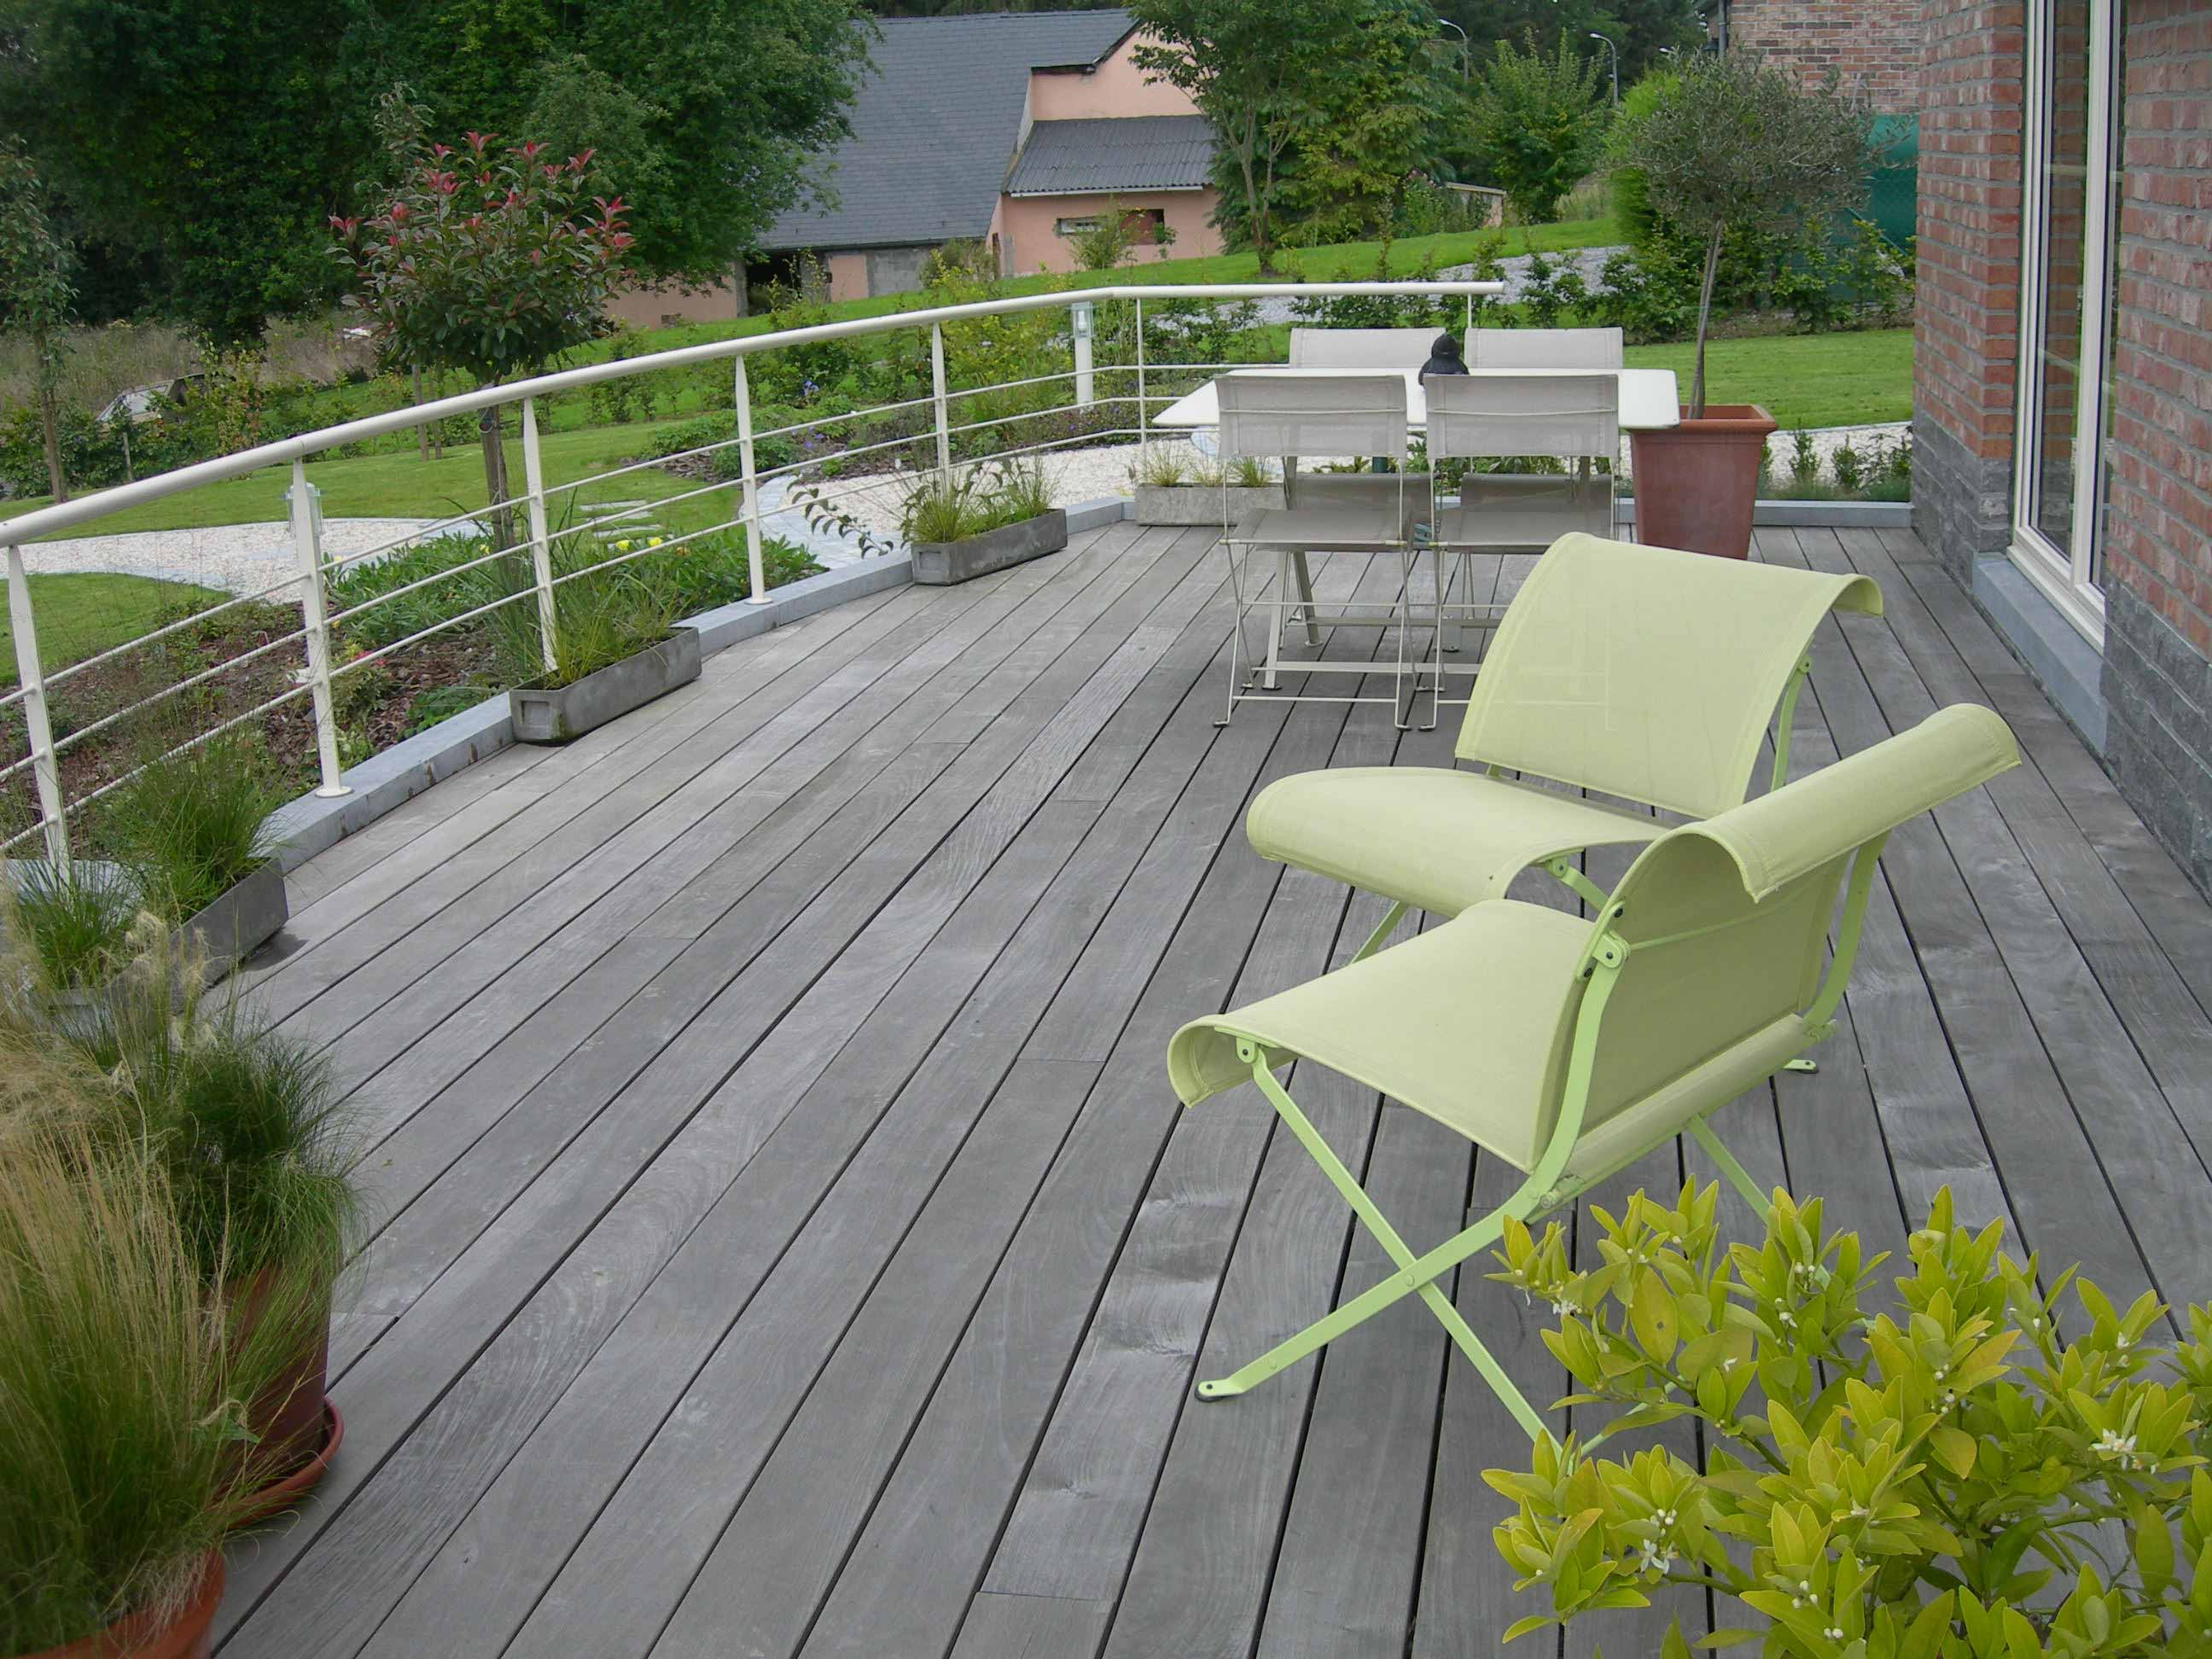 Doisje traiter ma terrasse en bois tous les ans ?